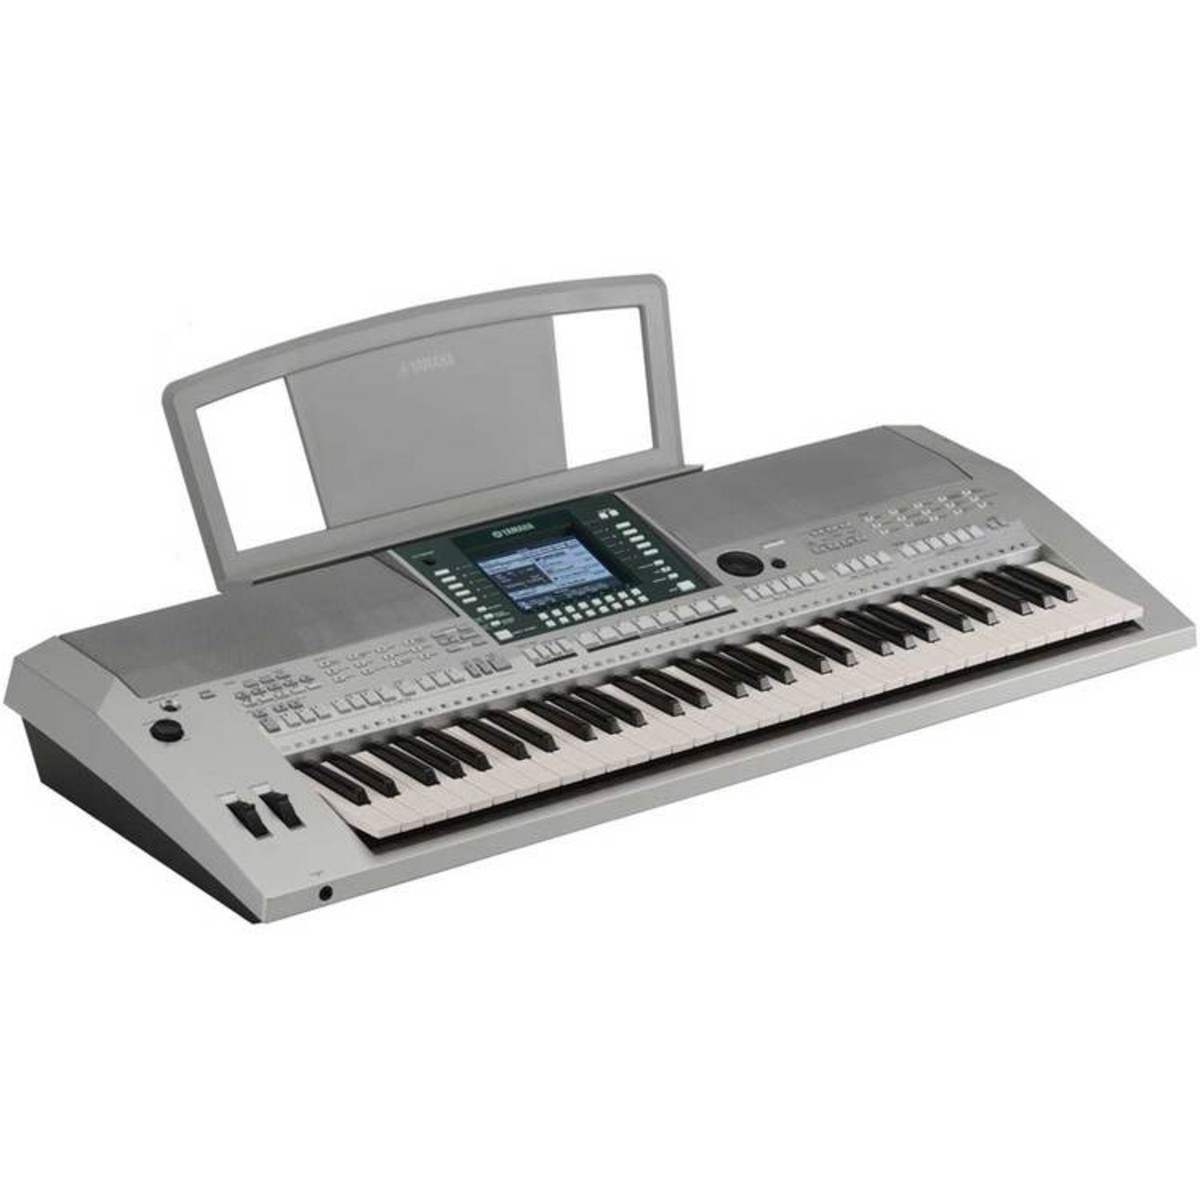 disc yamaha psr s710 keyboard at gear4music. Black Bedroom Furniture Sets. Home Design Ideas